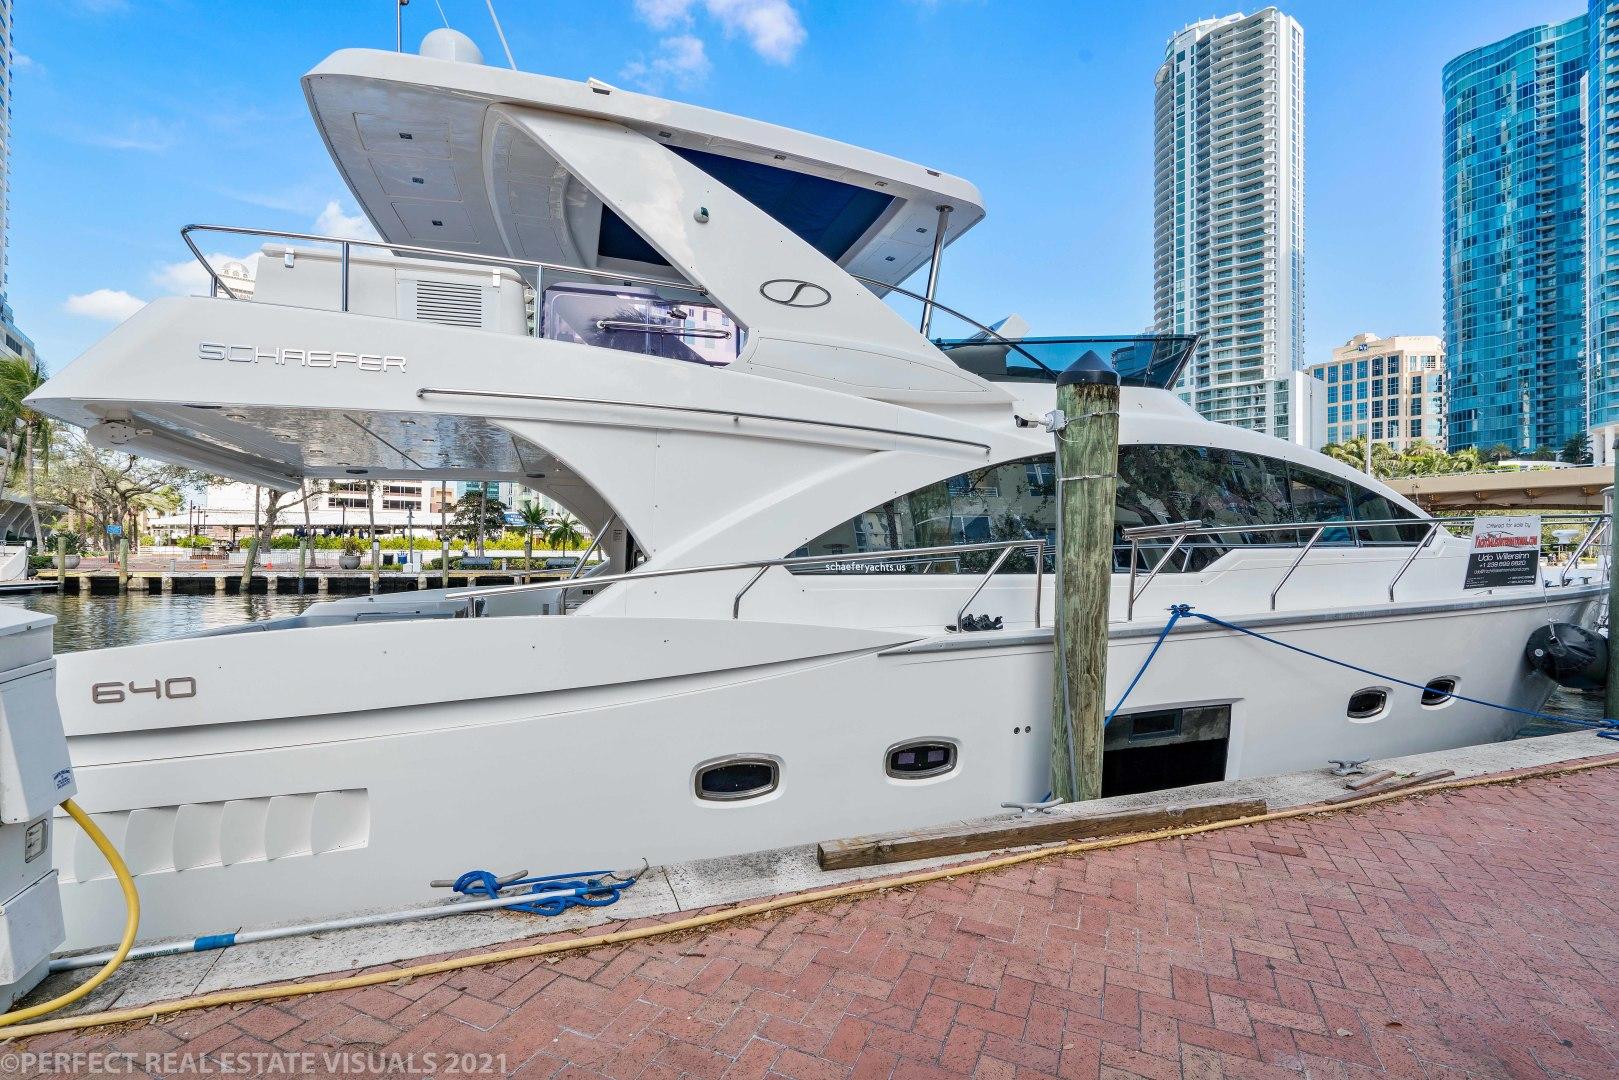 Schaefer-640 2017 -Fort Lauderdale-United States-1600566 | Thumbnail